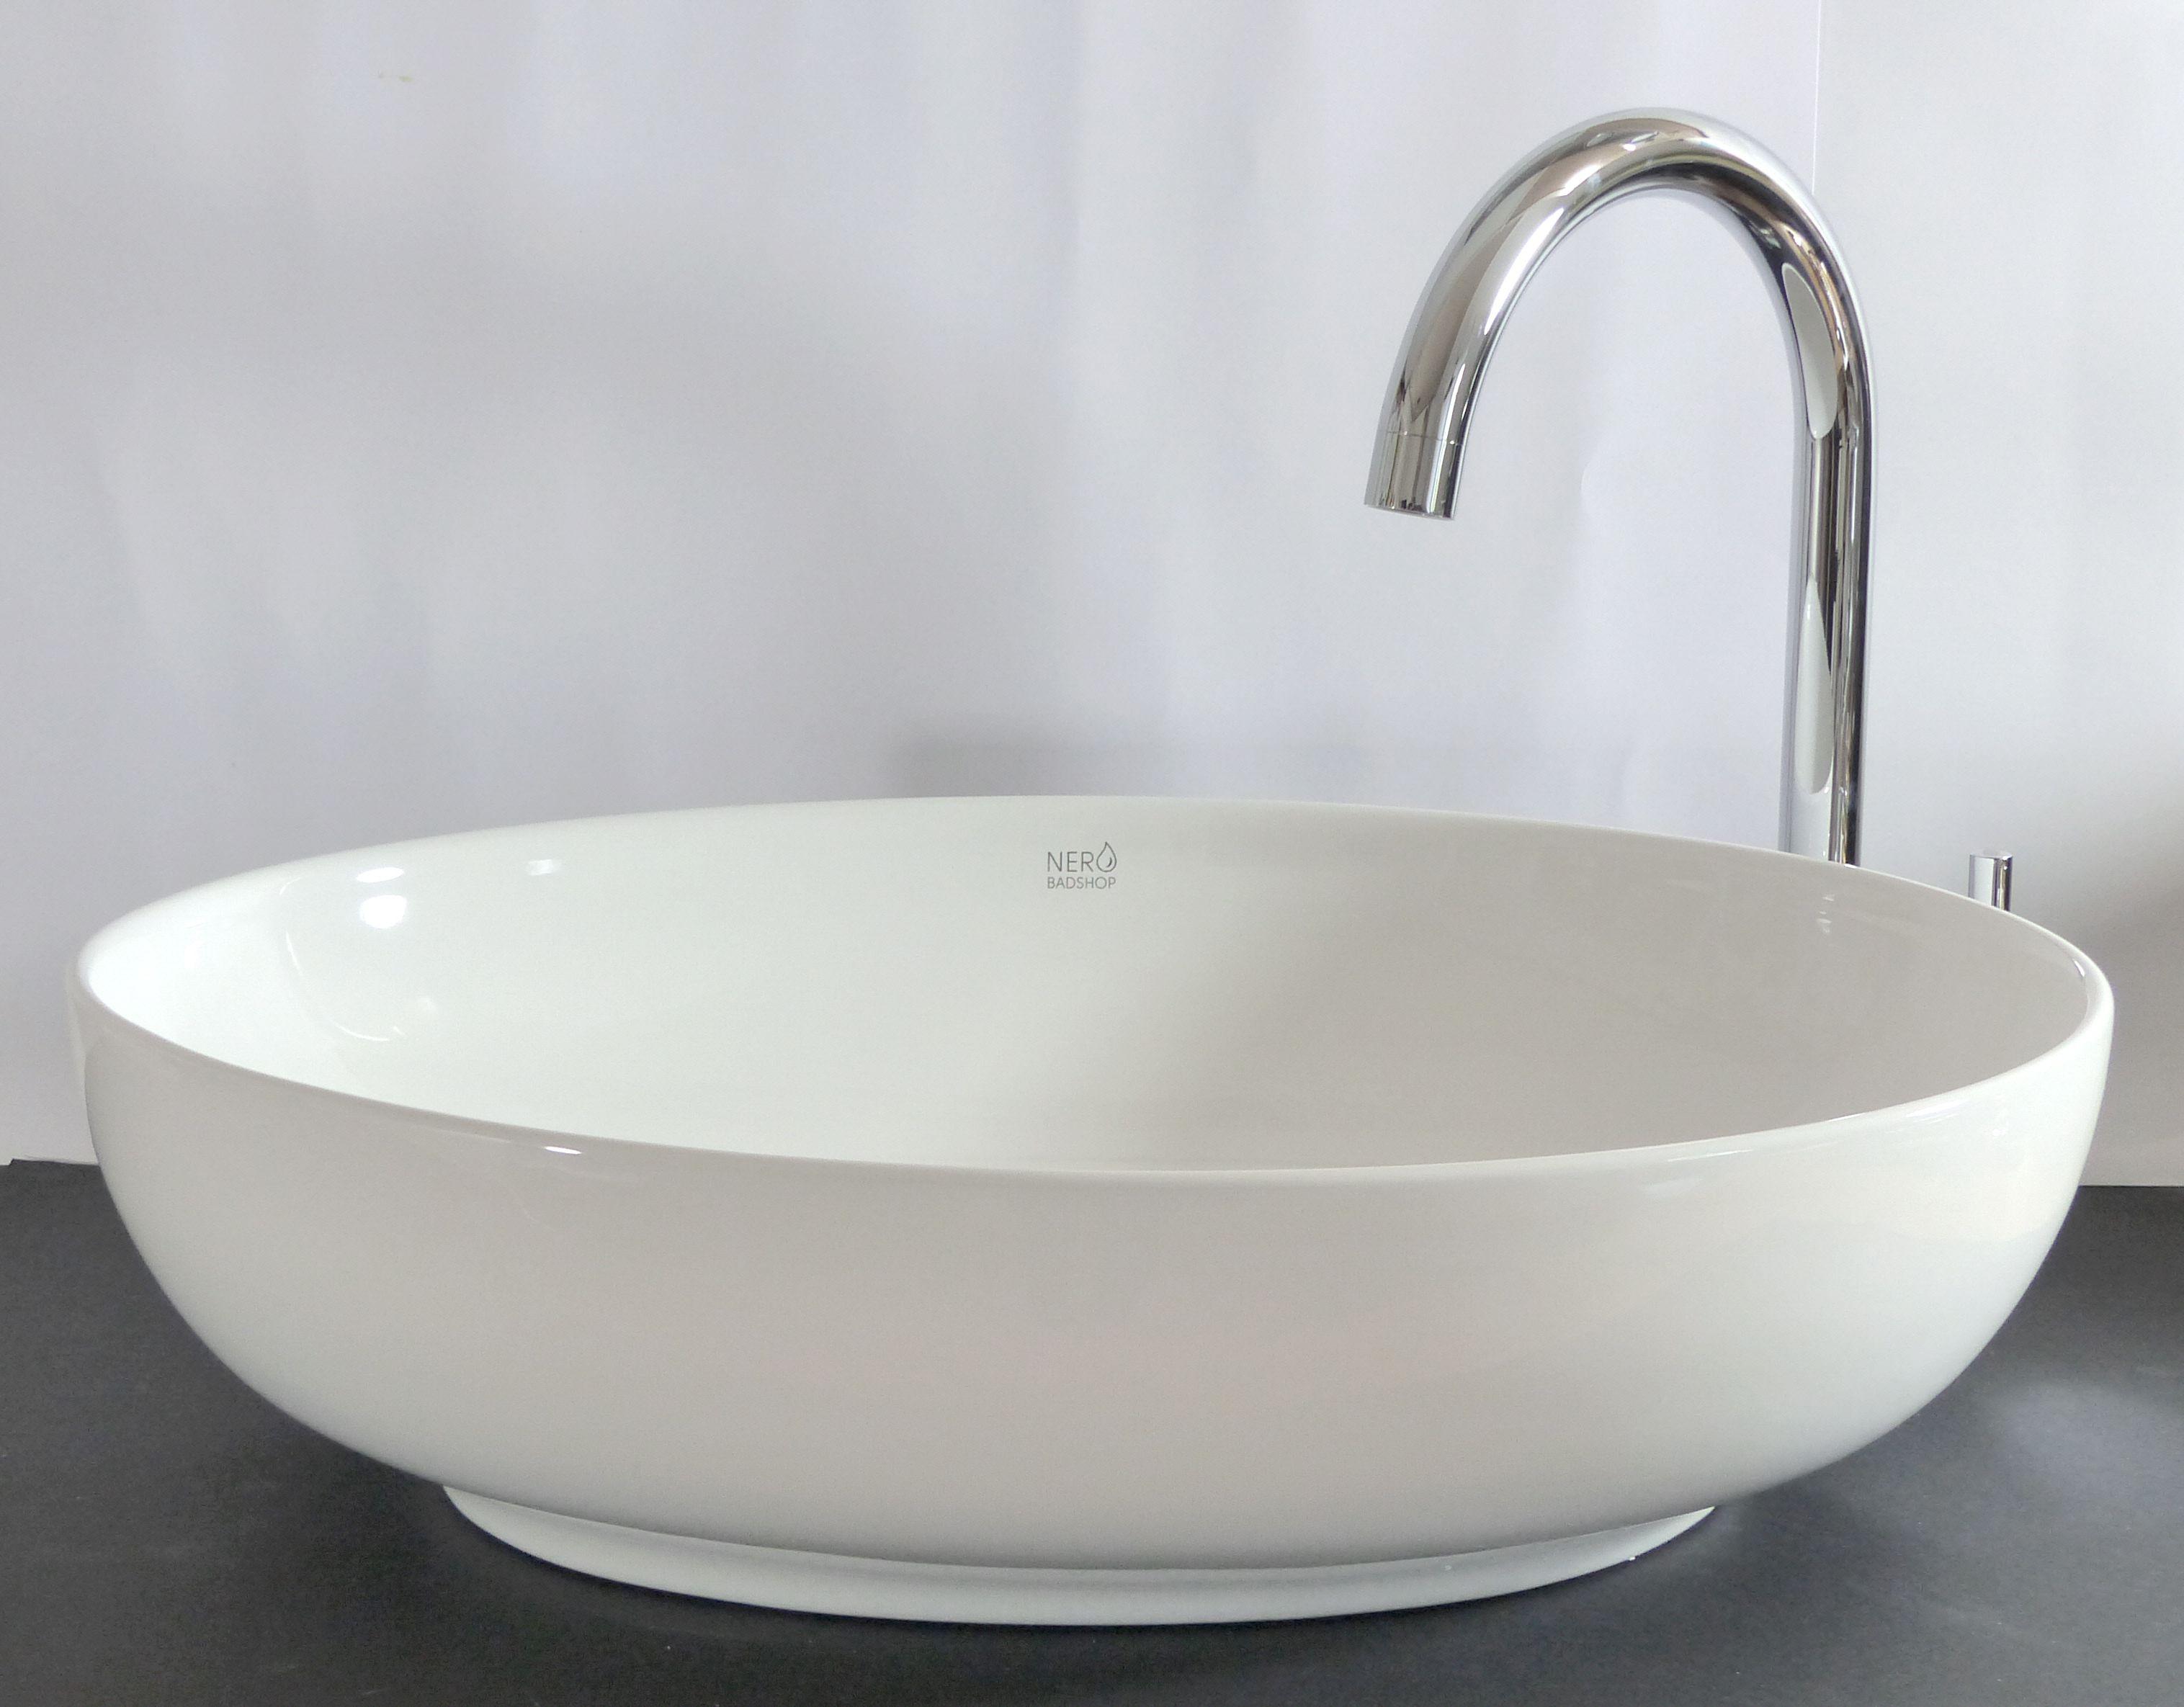 Waschbecken Oval Aufsatz nero badshop keramik aufsatz waschbecken oval kaufen